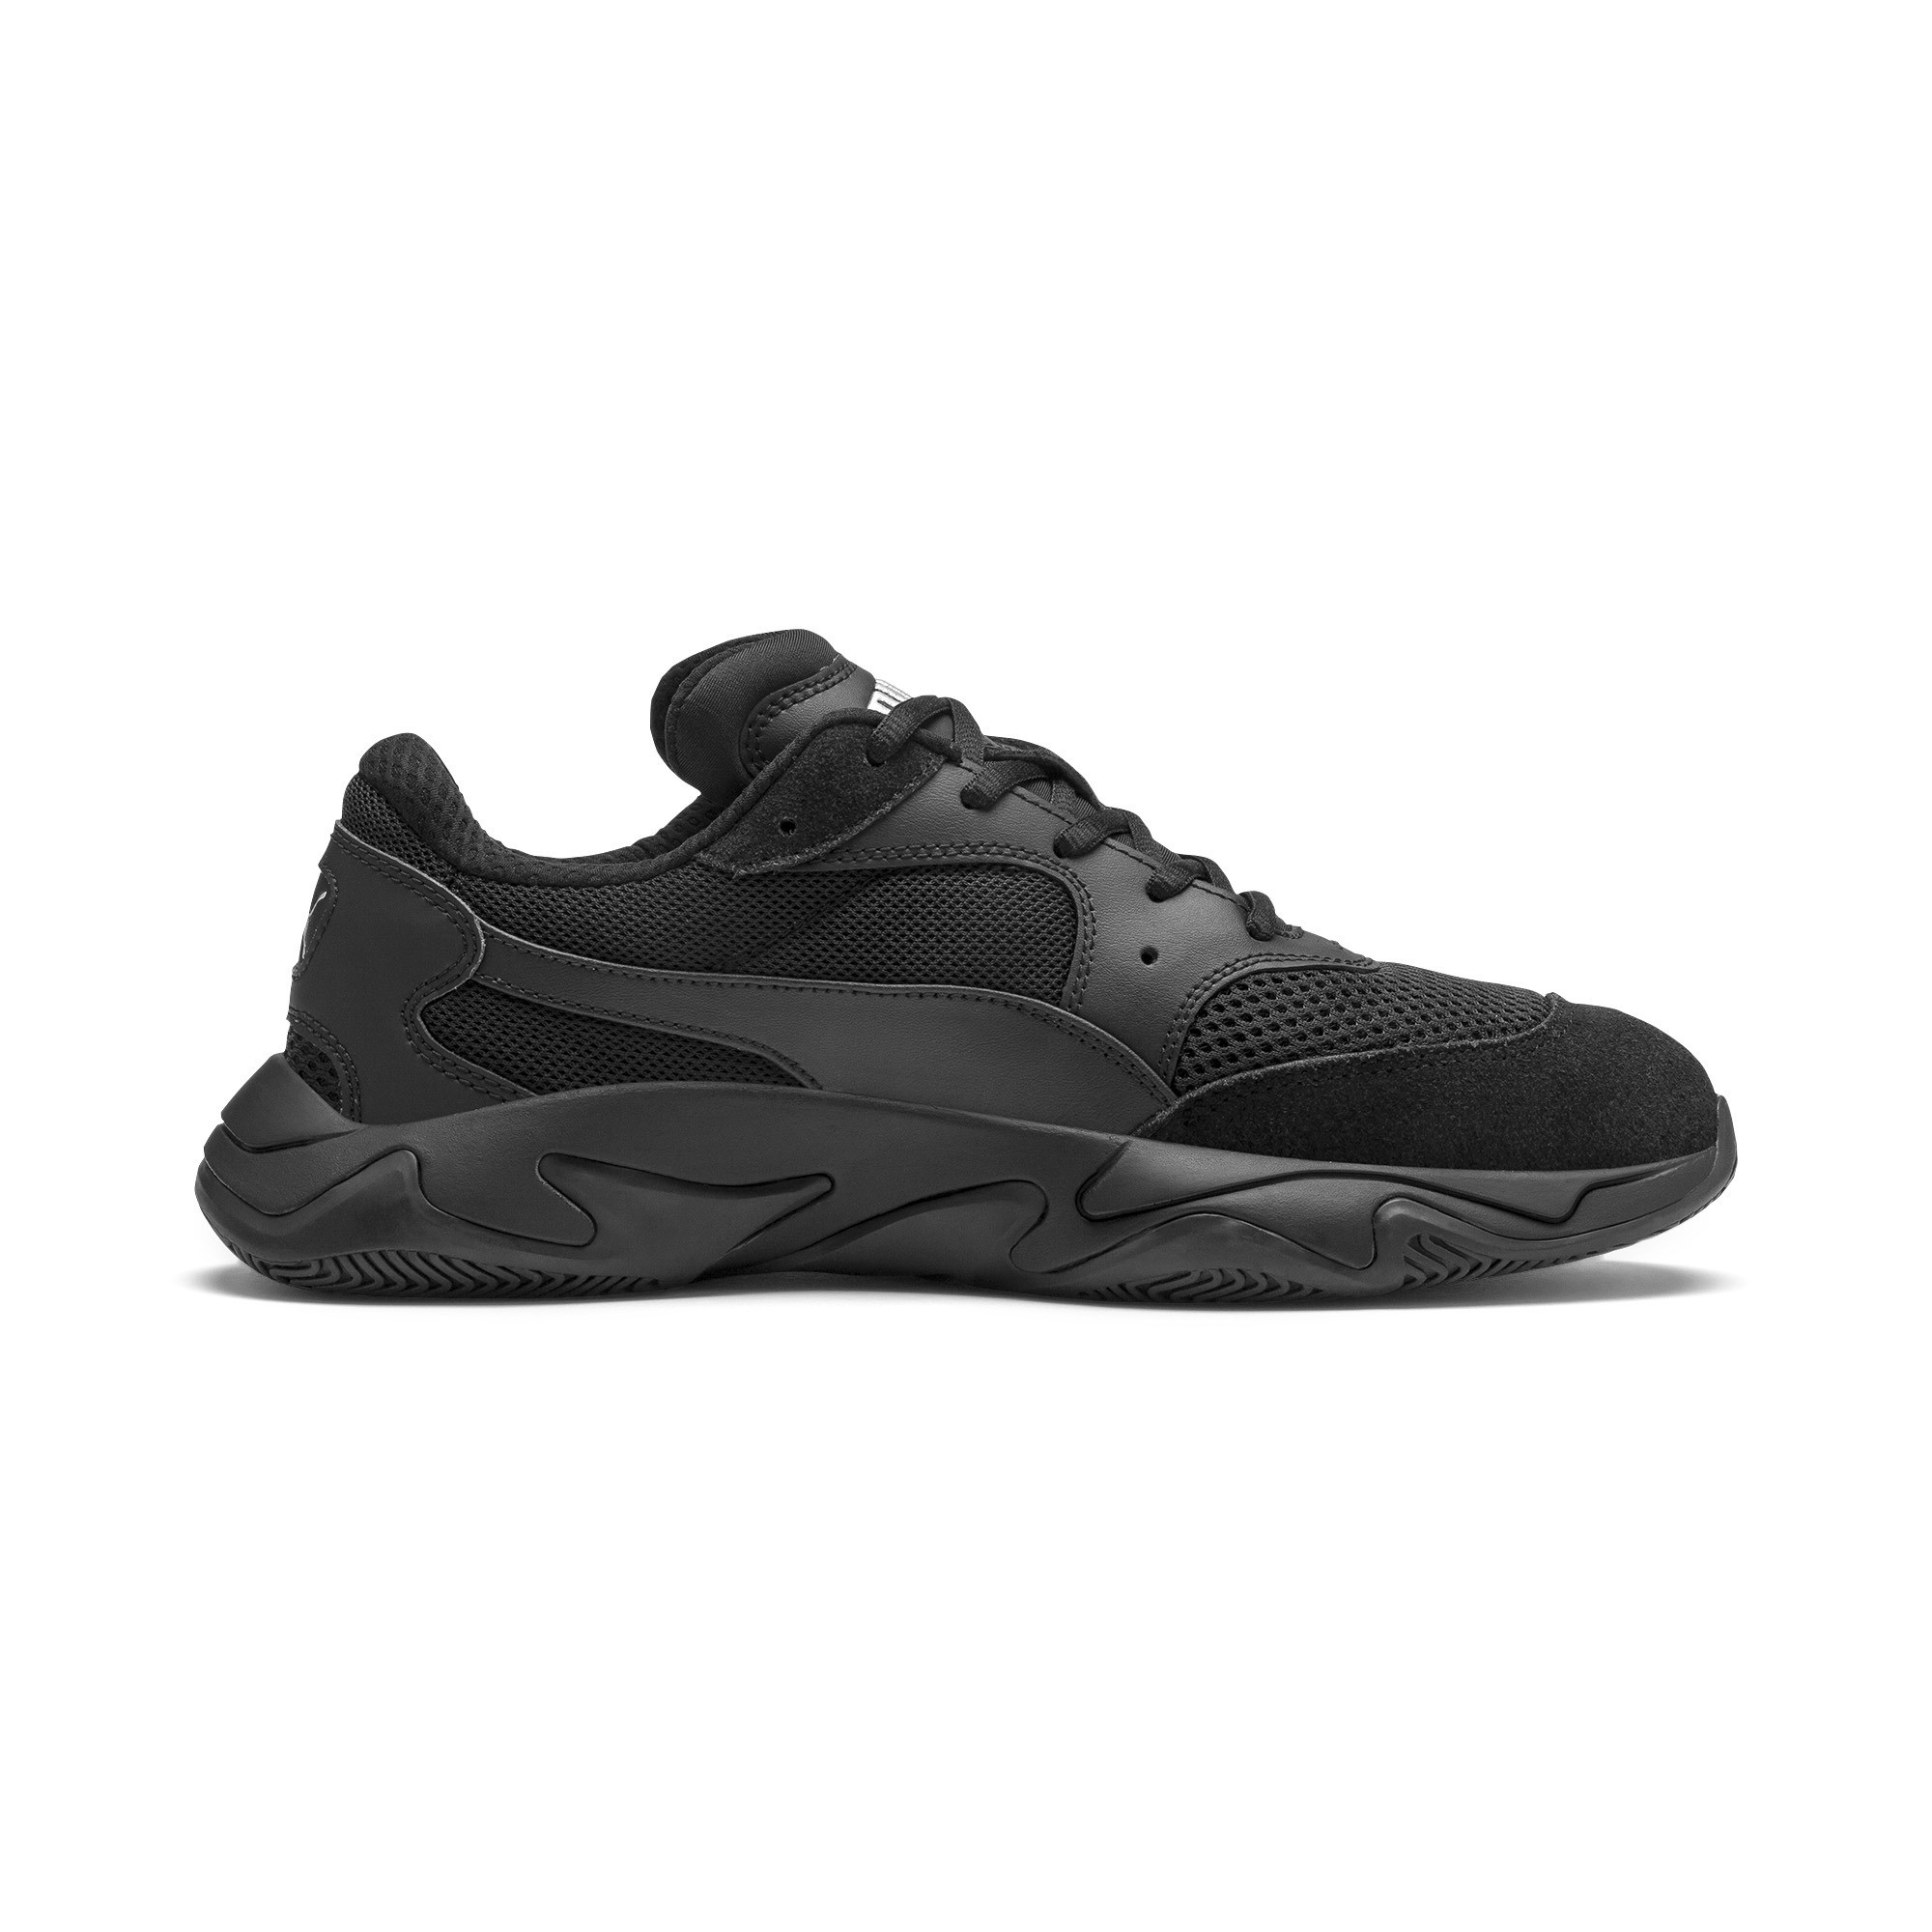 PUMA-Storm-Origin-Sneakers-Unisex-Shoe-Evolution thumbnail 7